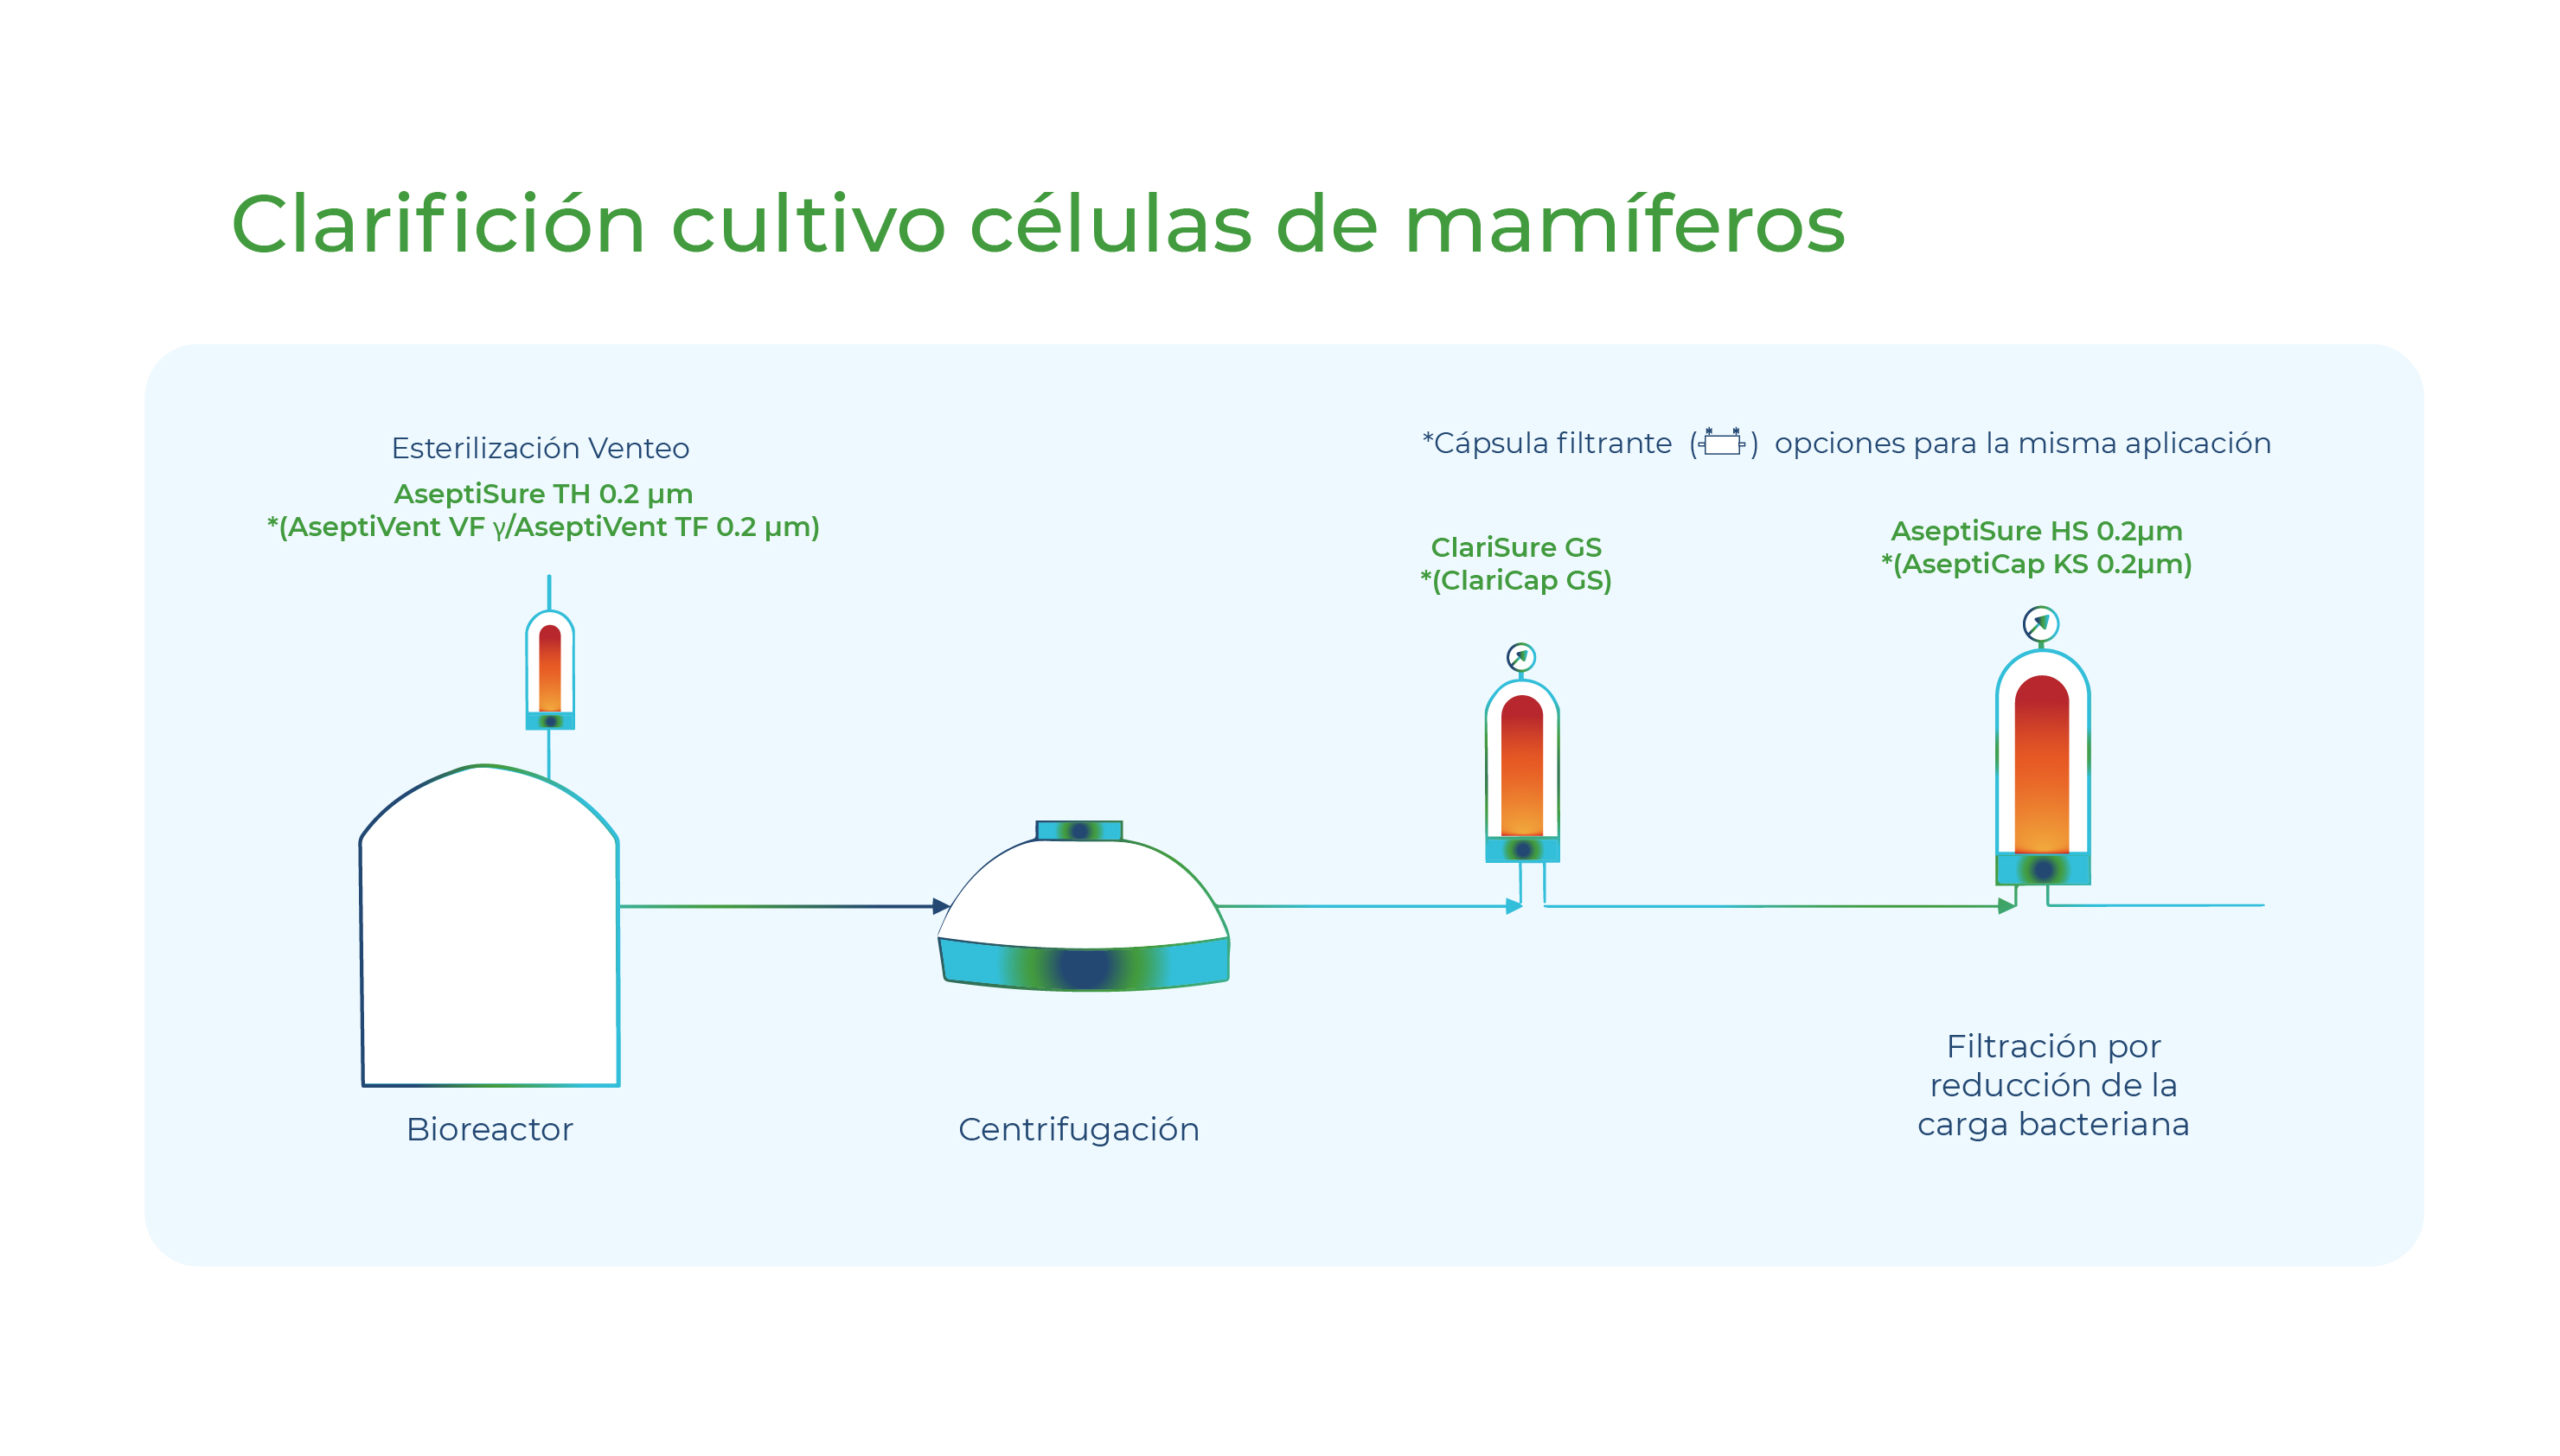 Diagrama Clarificación cultivo células de mamíferos. Gesfilter